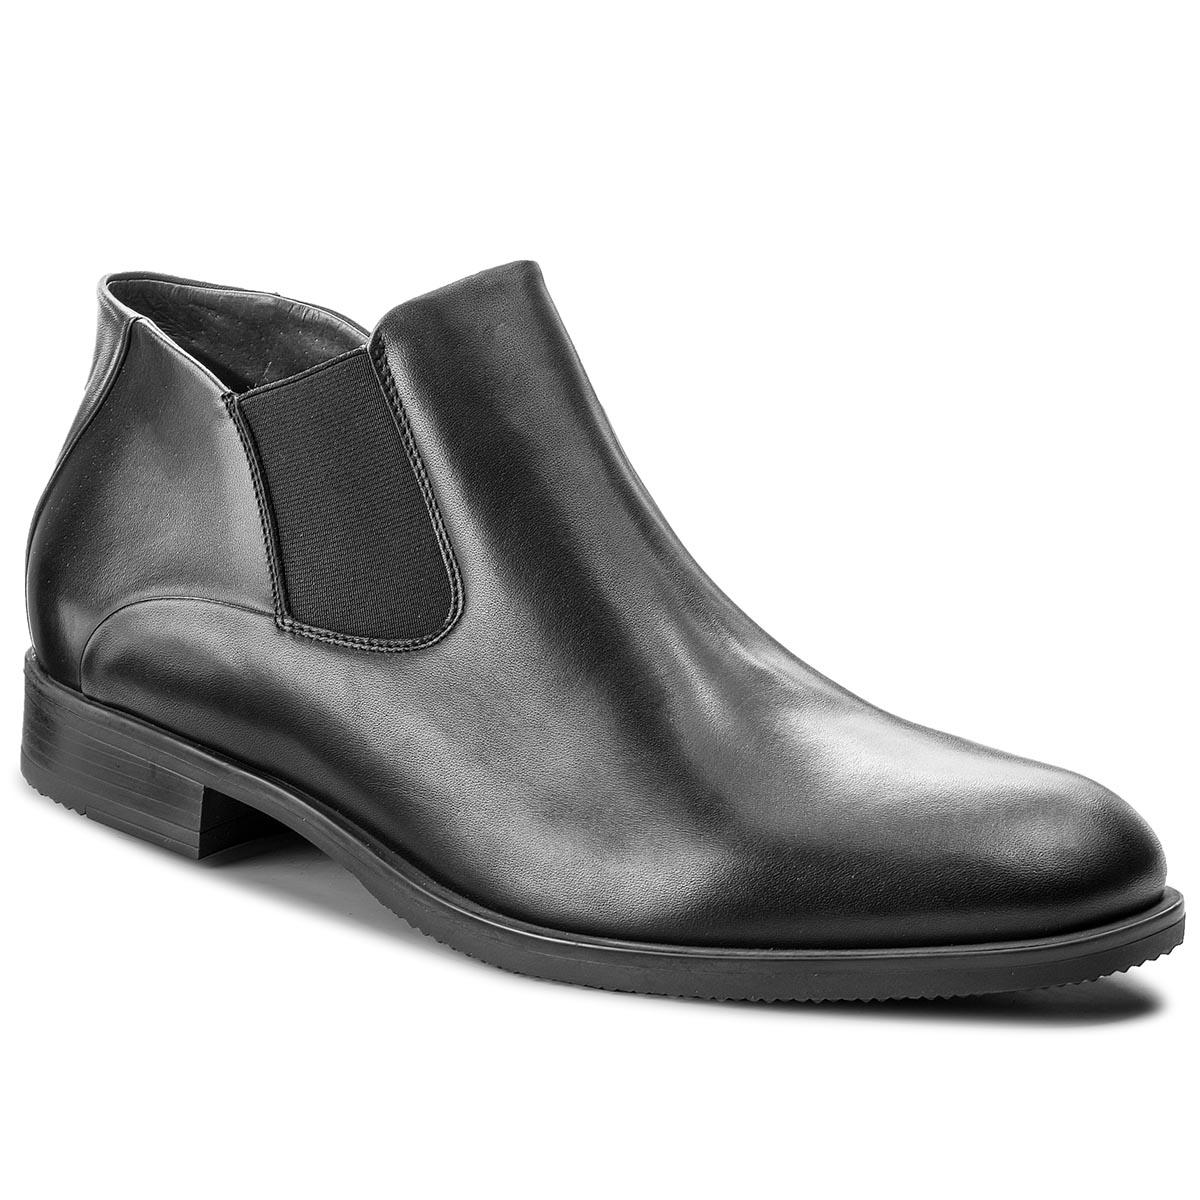 Kotníková obuv s elastickým prvkom GINO ROSSI - Chuck  MSV616-K35-E100-9900-0 99 5ee12c902e